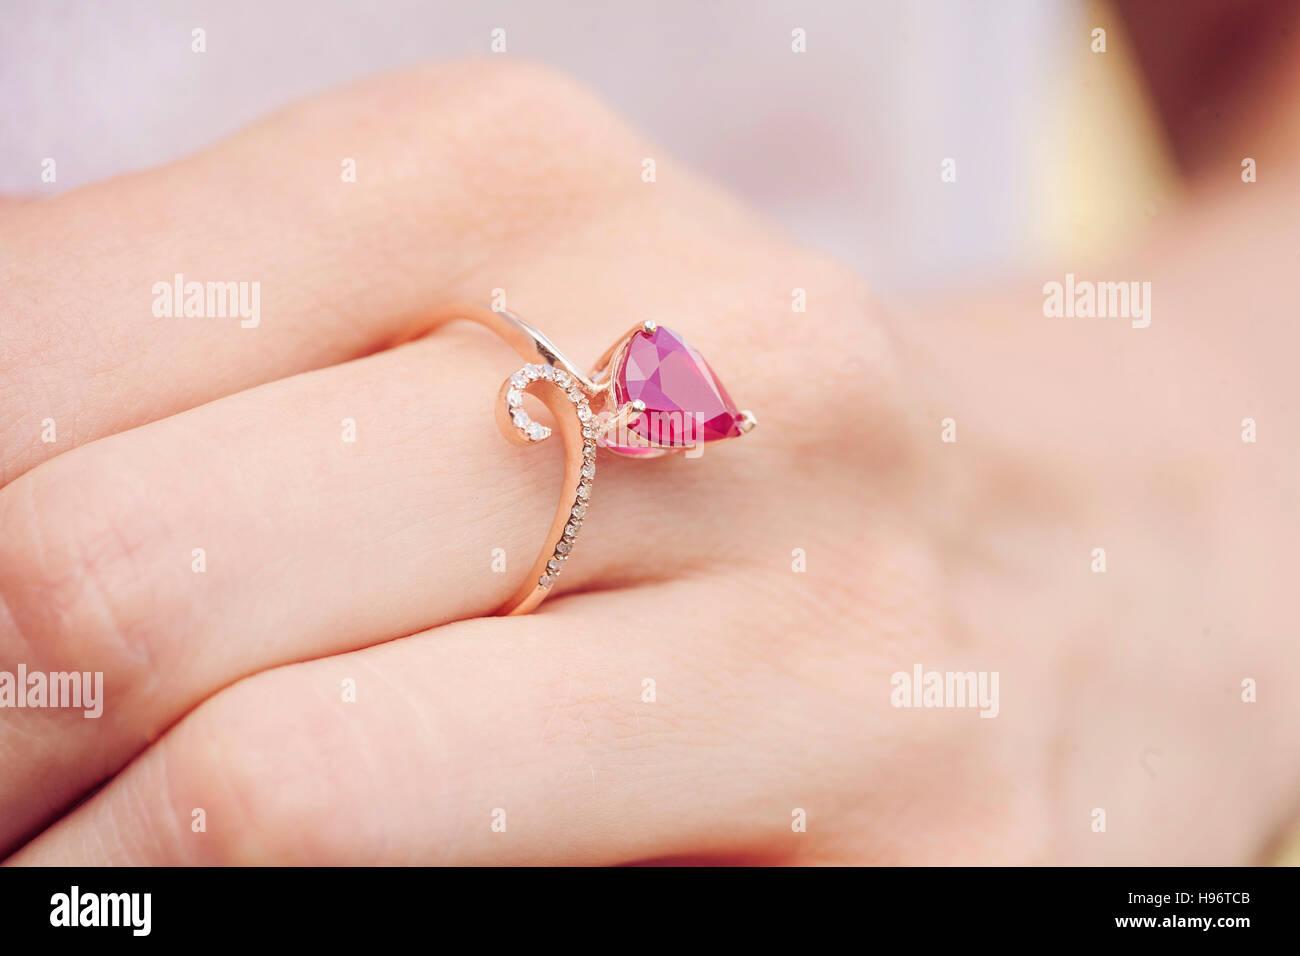 Ruby Gem Woman Stock Photos & Ruby Gem Woman Stock Images - Alamy